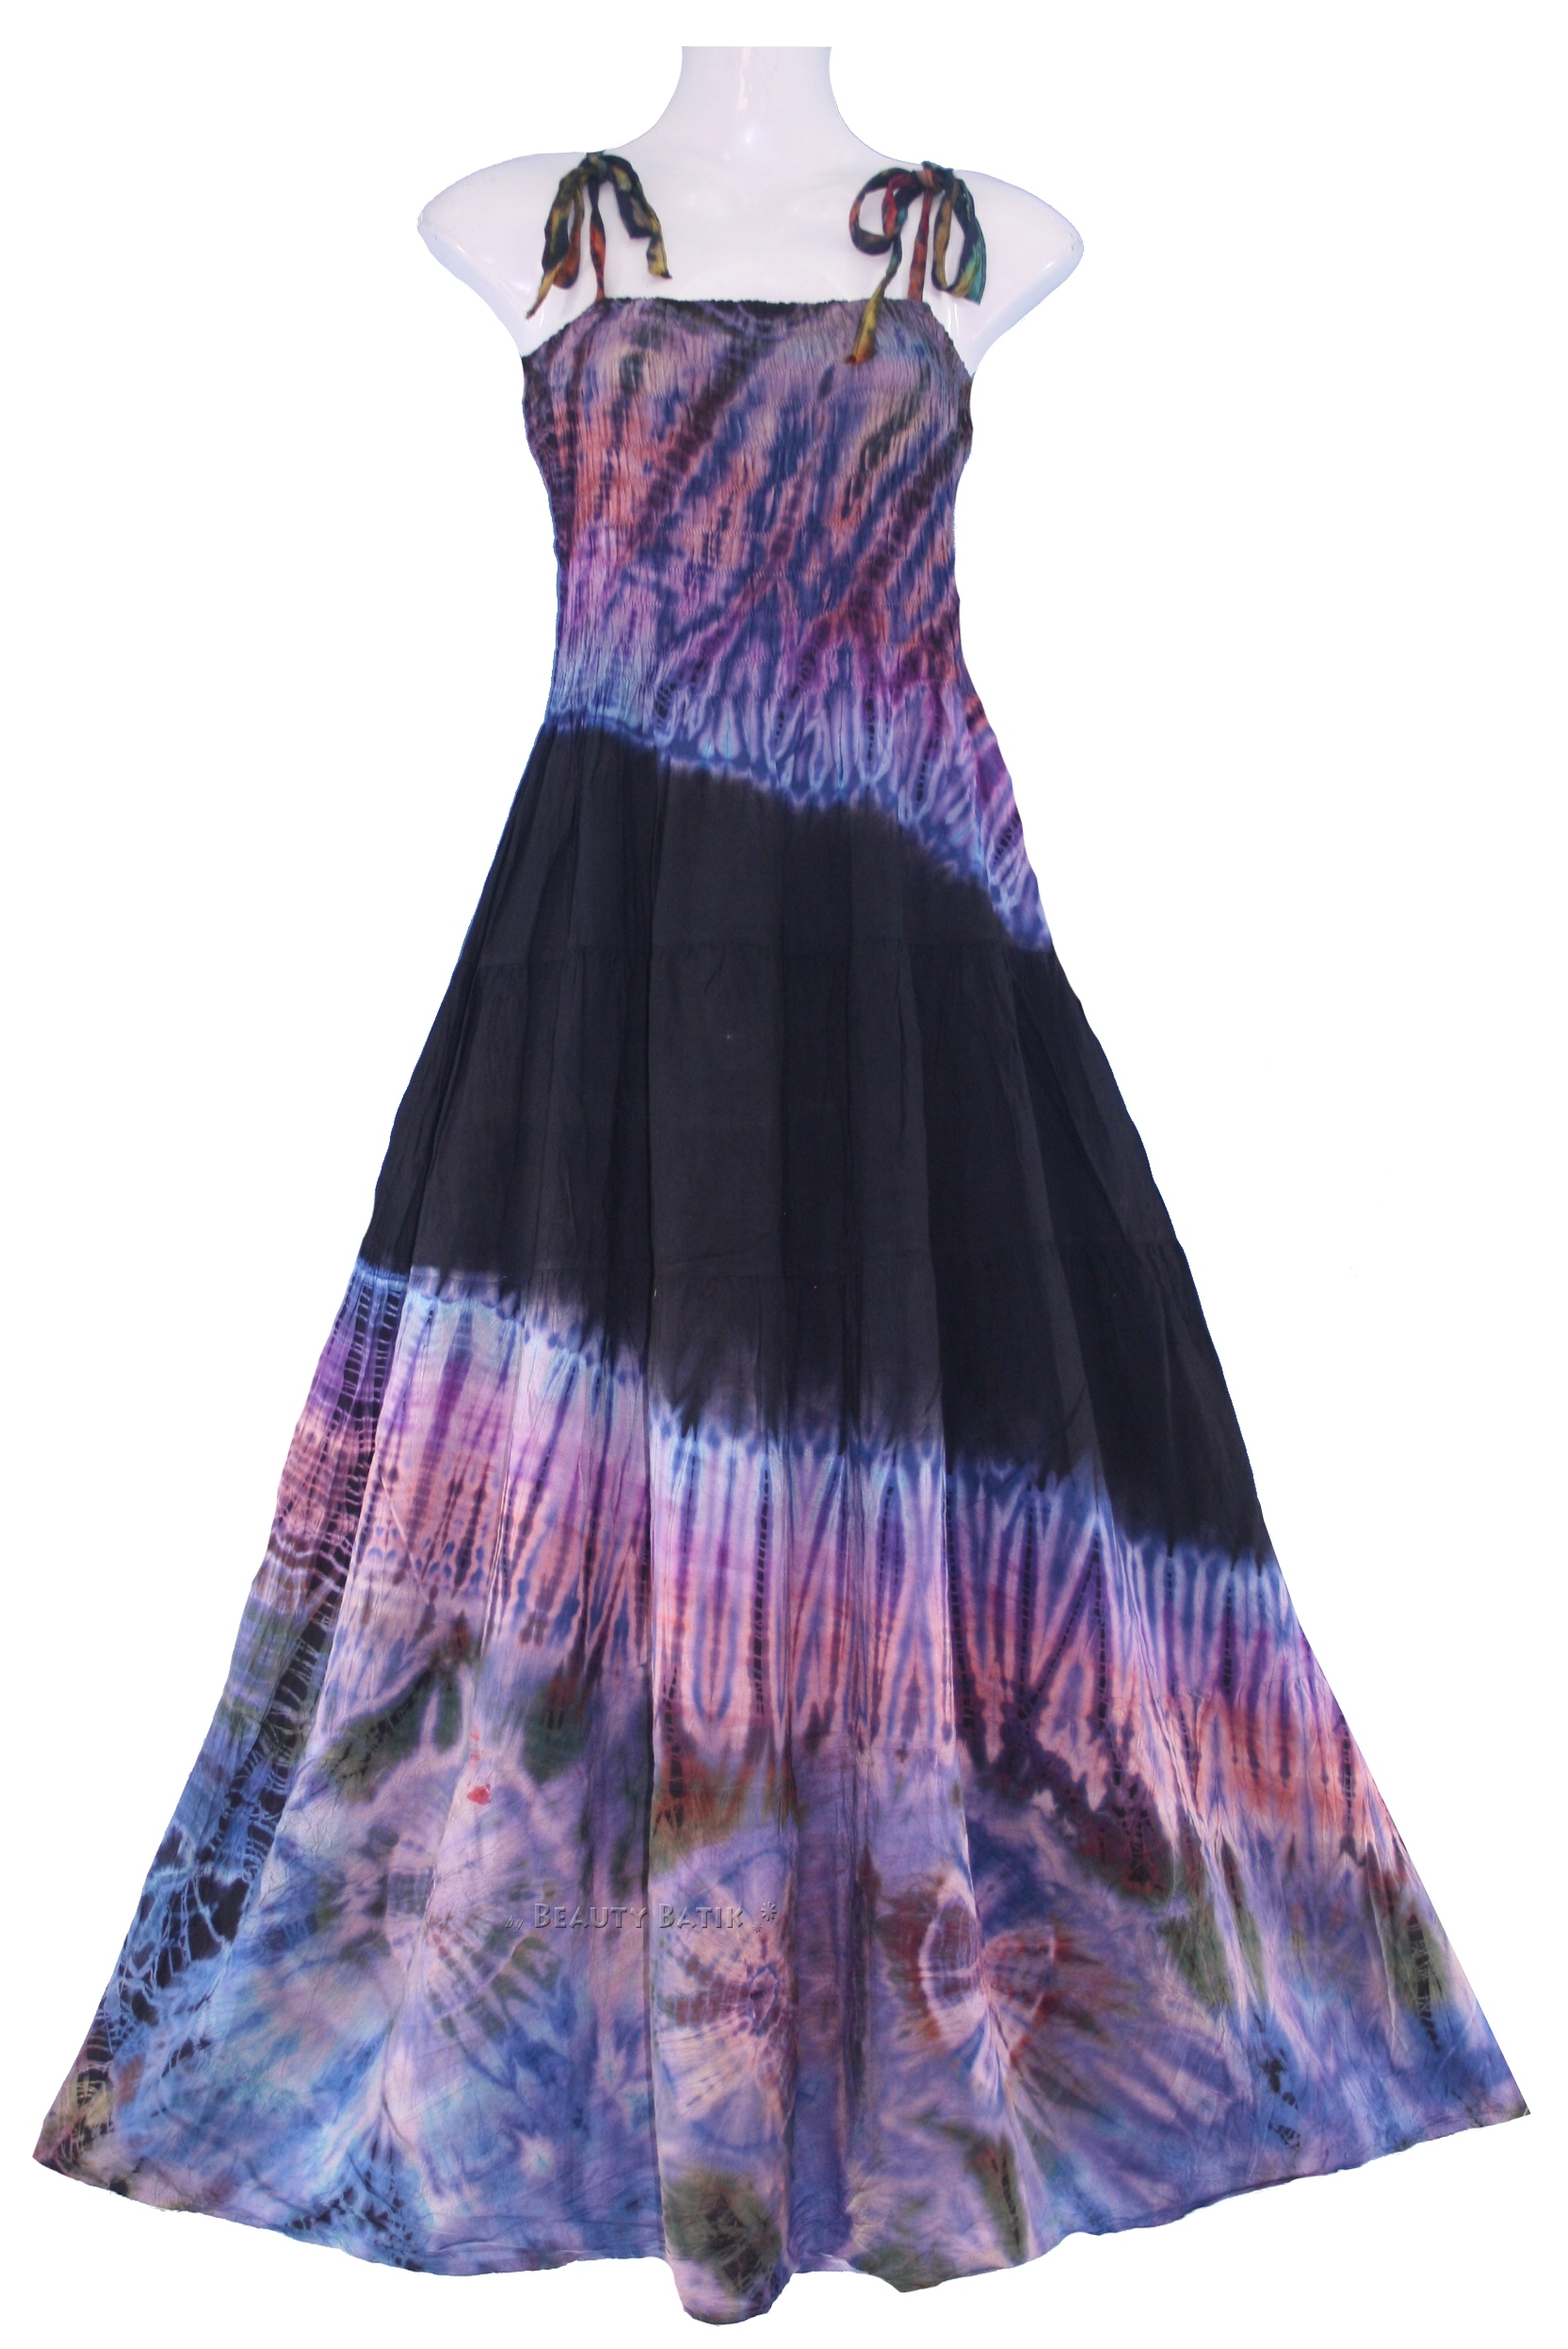 new boho hippie tie dye summer maxi sun dress sz l 14 16